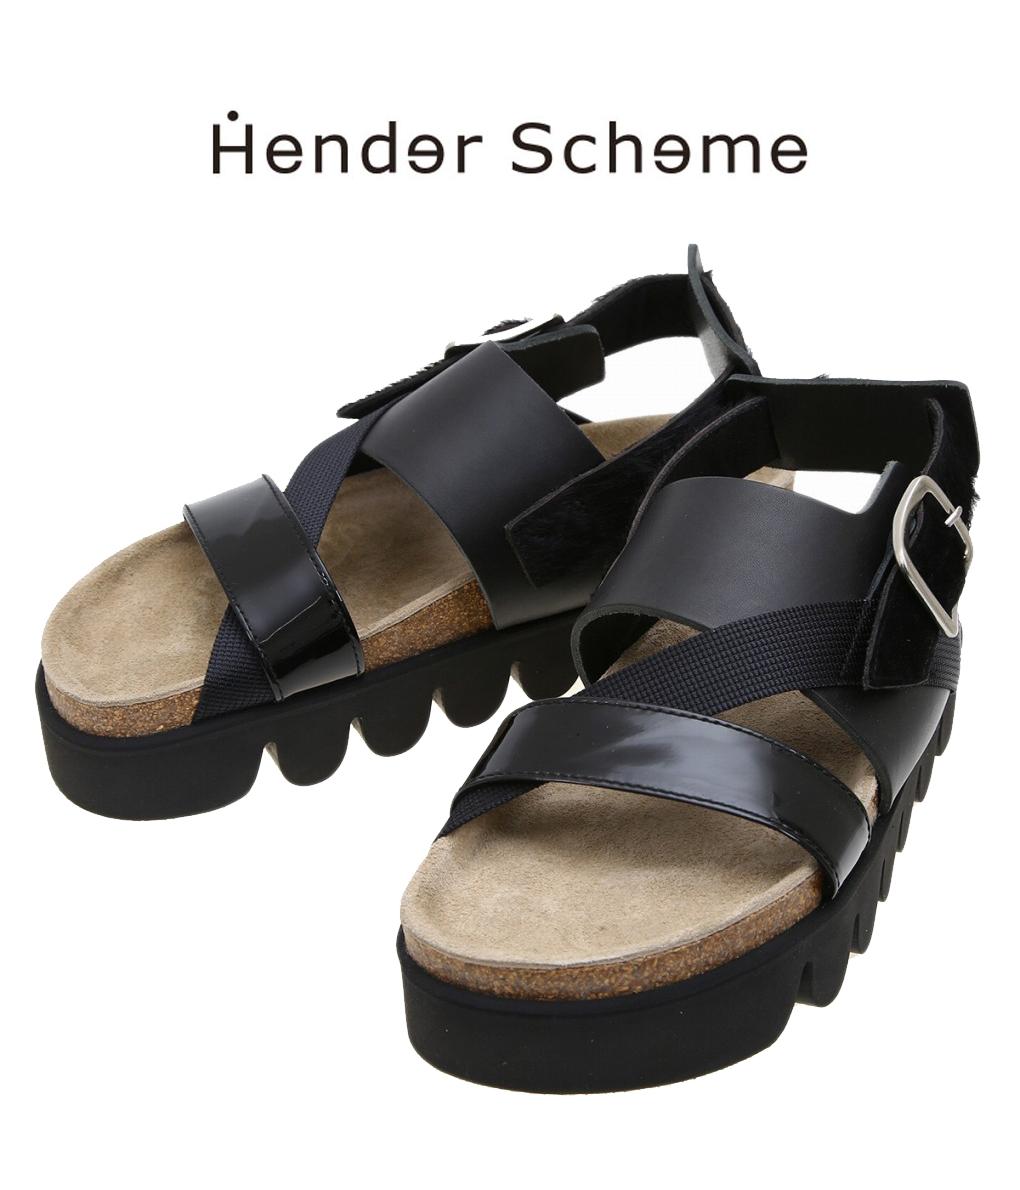 Hender Scheme / エンダースキーマ : tortoise : トータス レザーサンダル サンダル メンズ サンダル シューズ : NC-S-TOR 【RIP】【BJB】